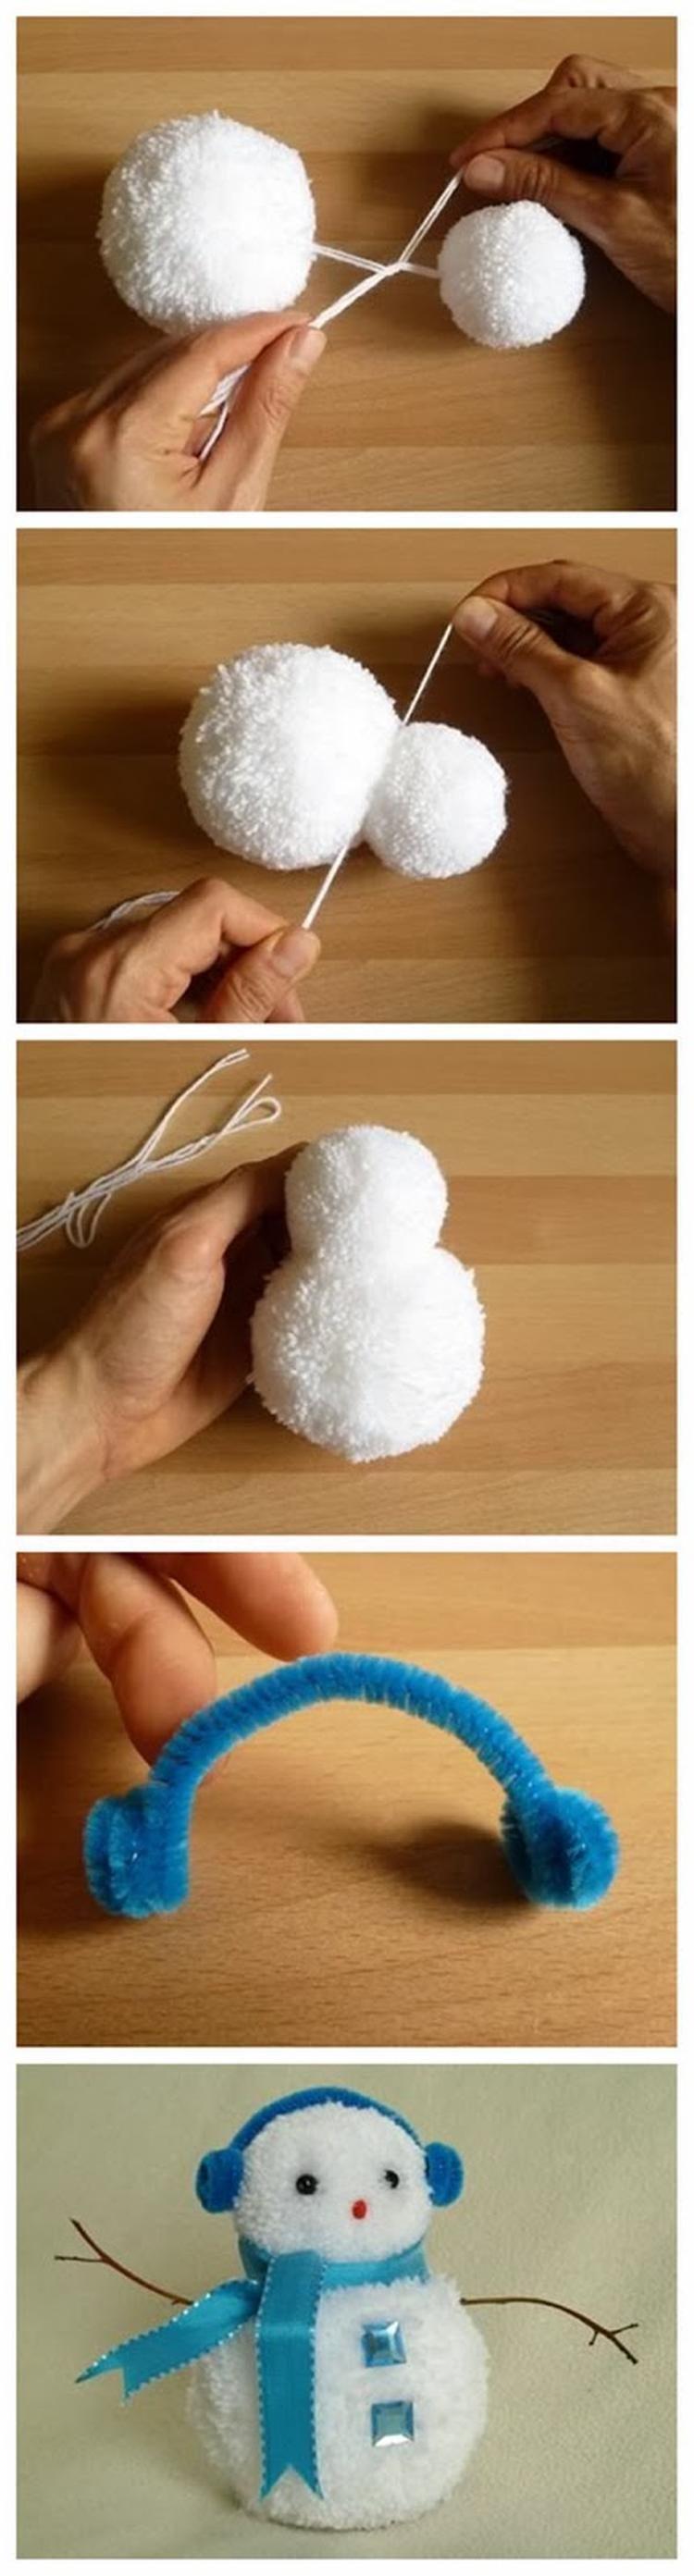 sneeuwpopje van pompoenen